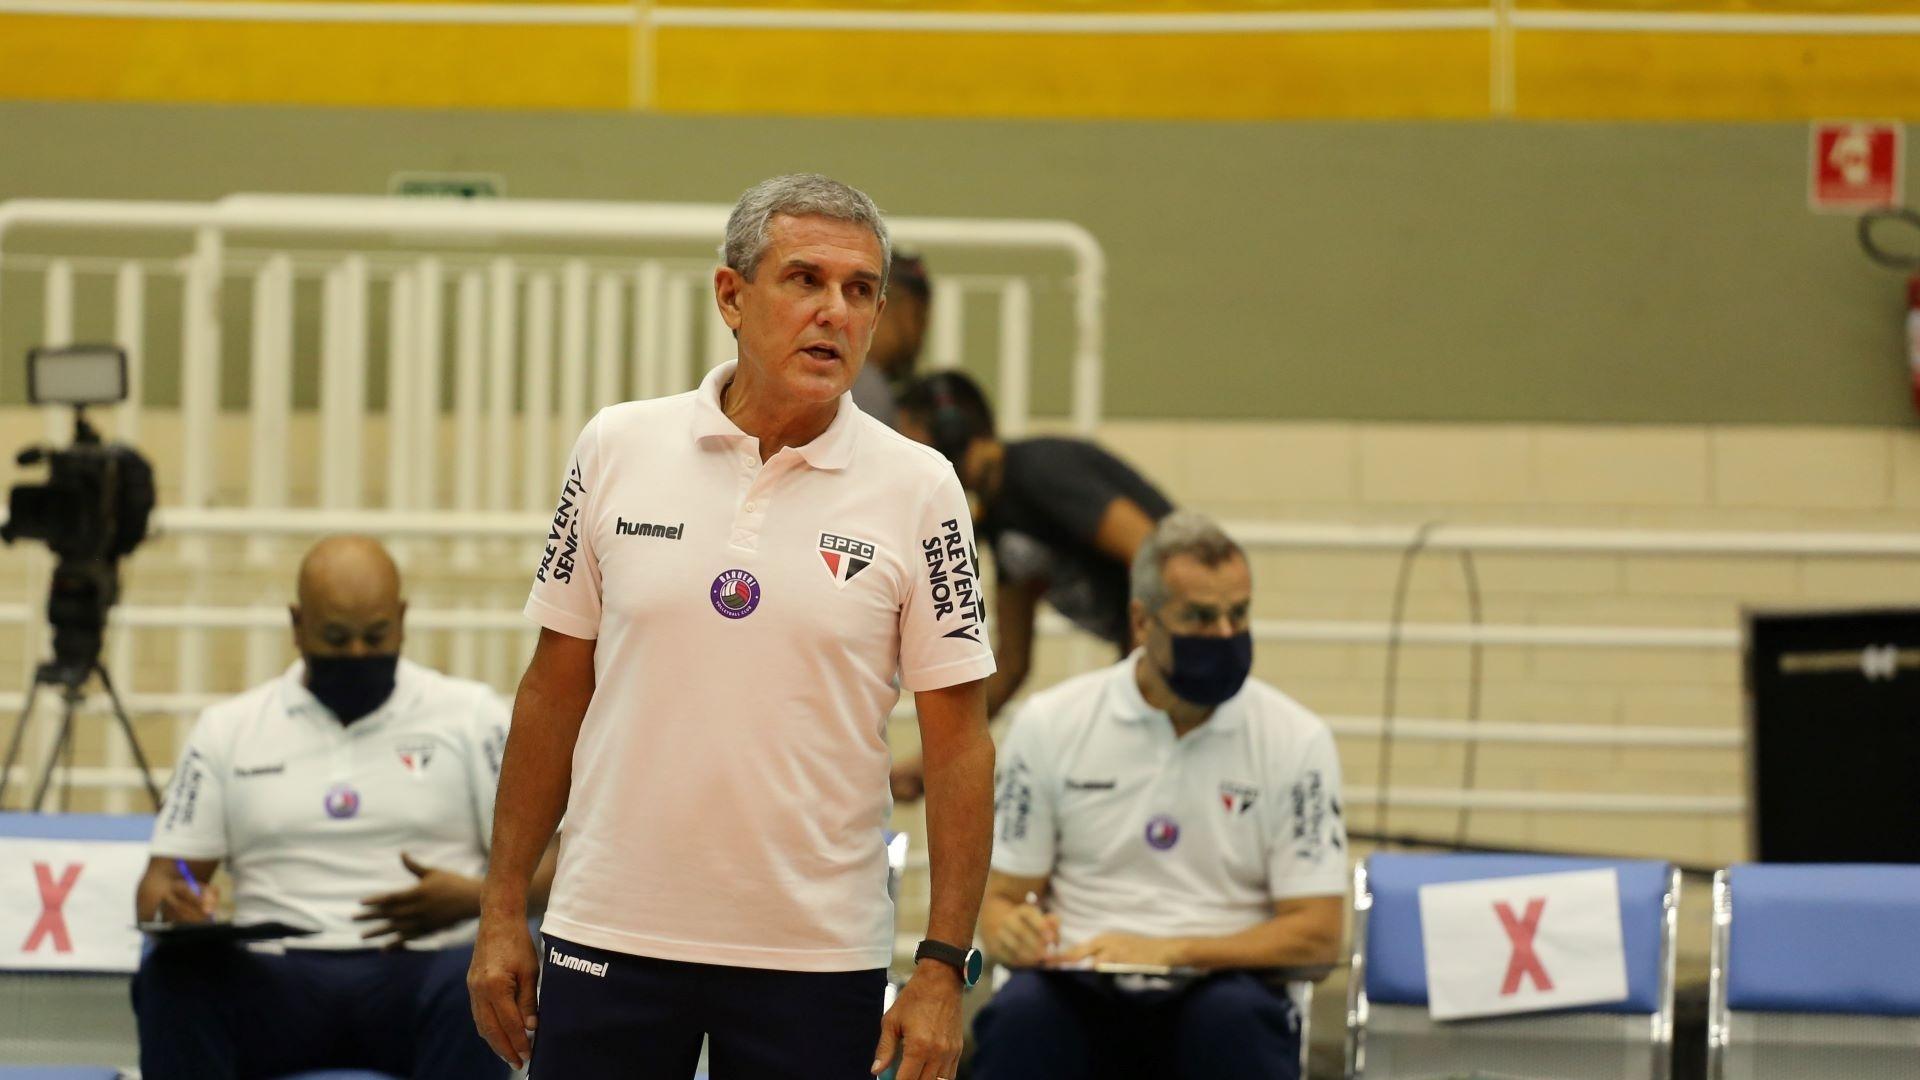 José Roberto Guimarães, técnico do São Paulo/Barueri